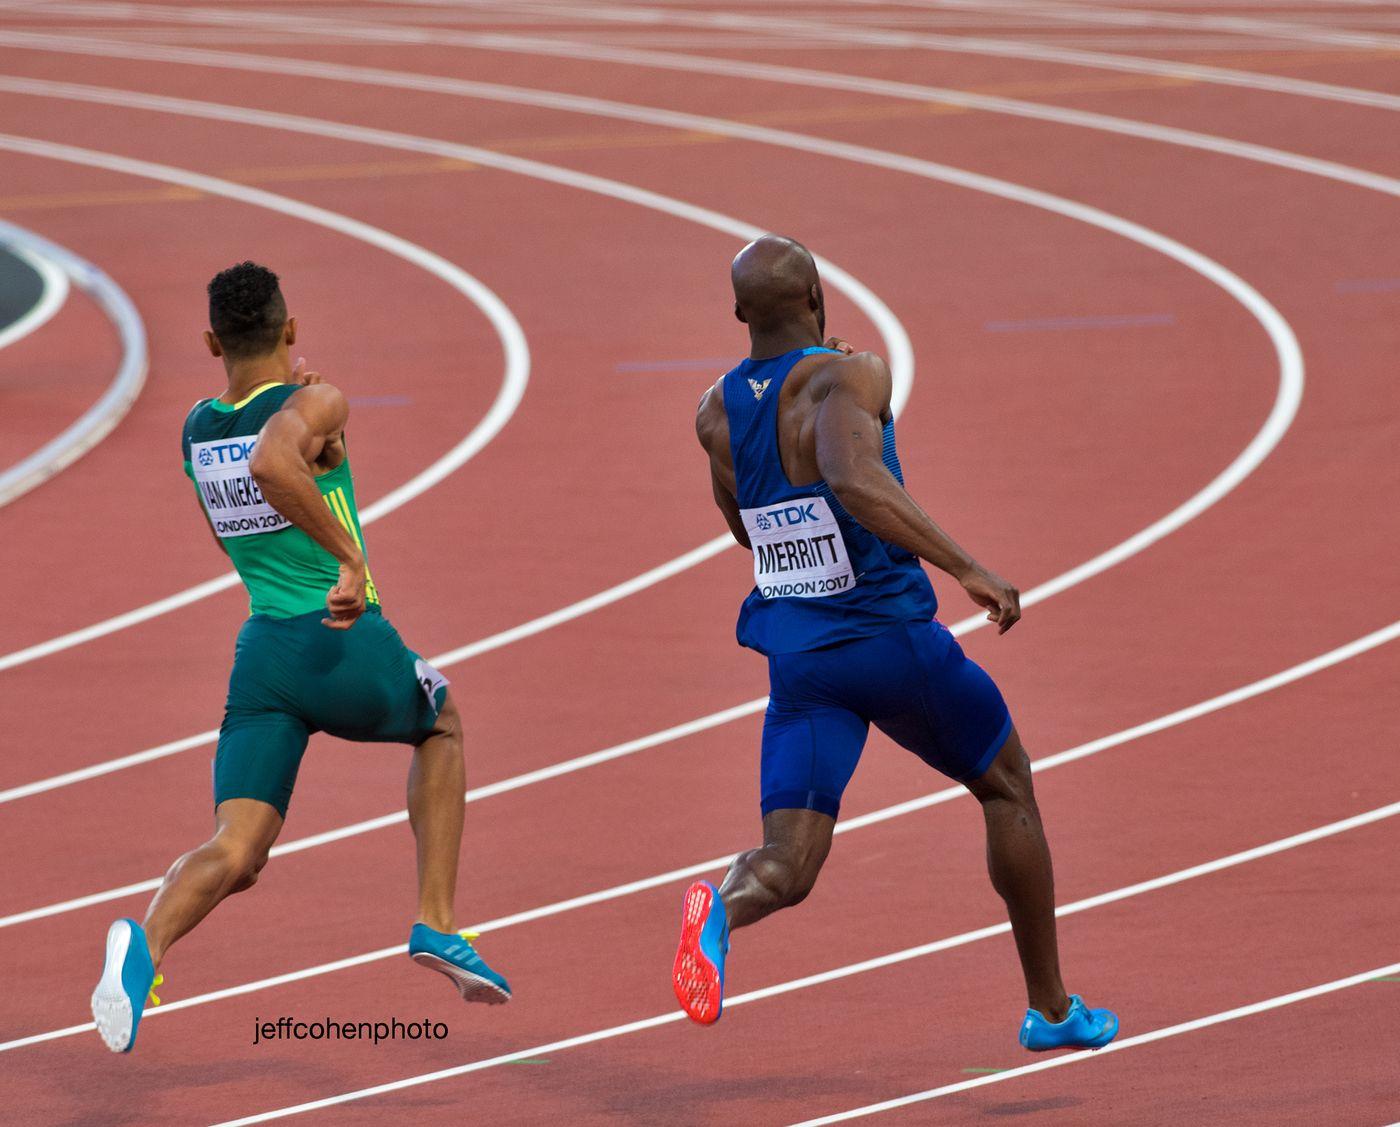 2017-IAAF-WC-London-night-niekirk-merrett-400m-3-579-jeff-cohen-photo--web.jpg